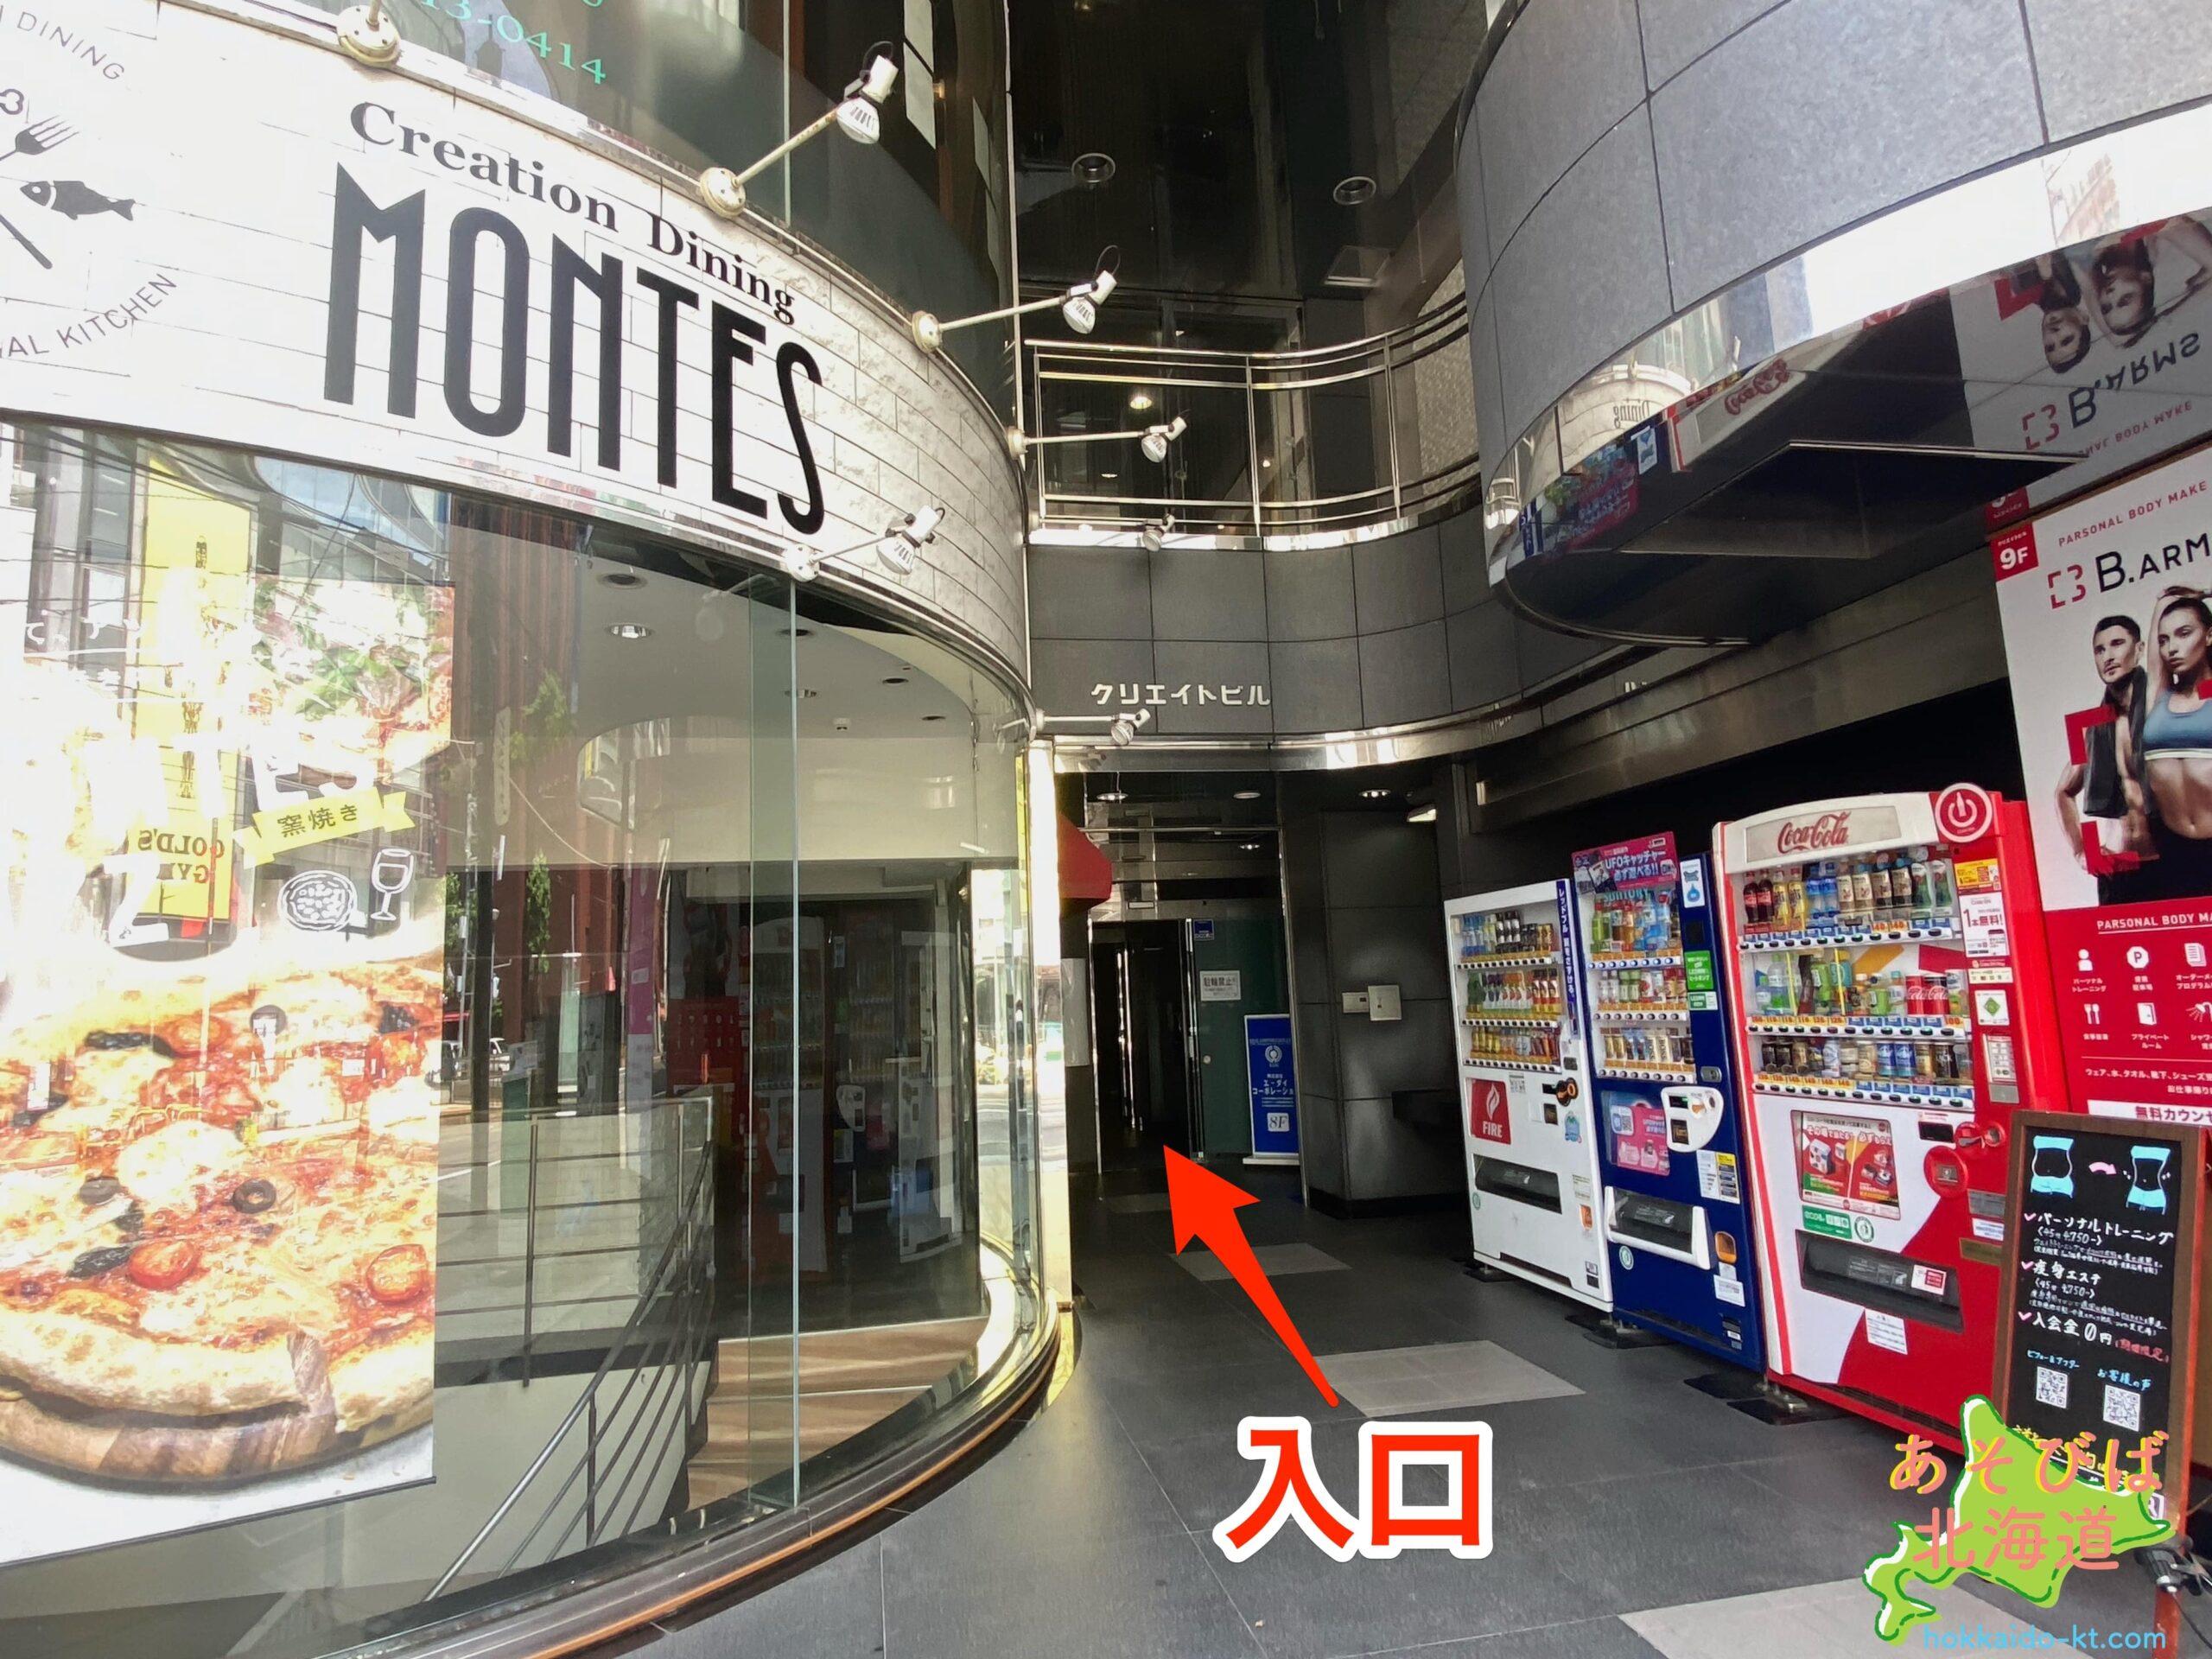 c3札幌大通店アクセス